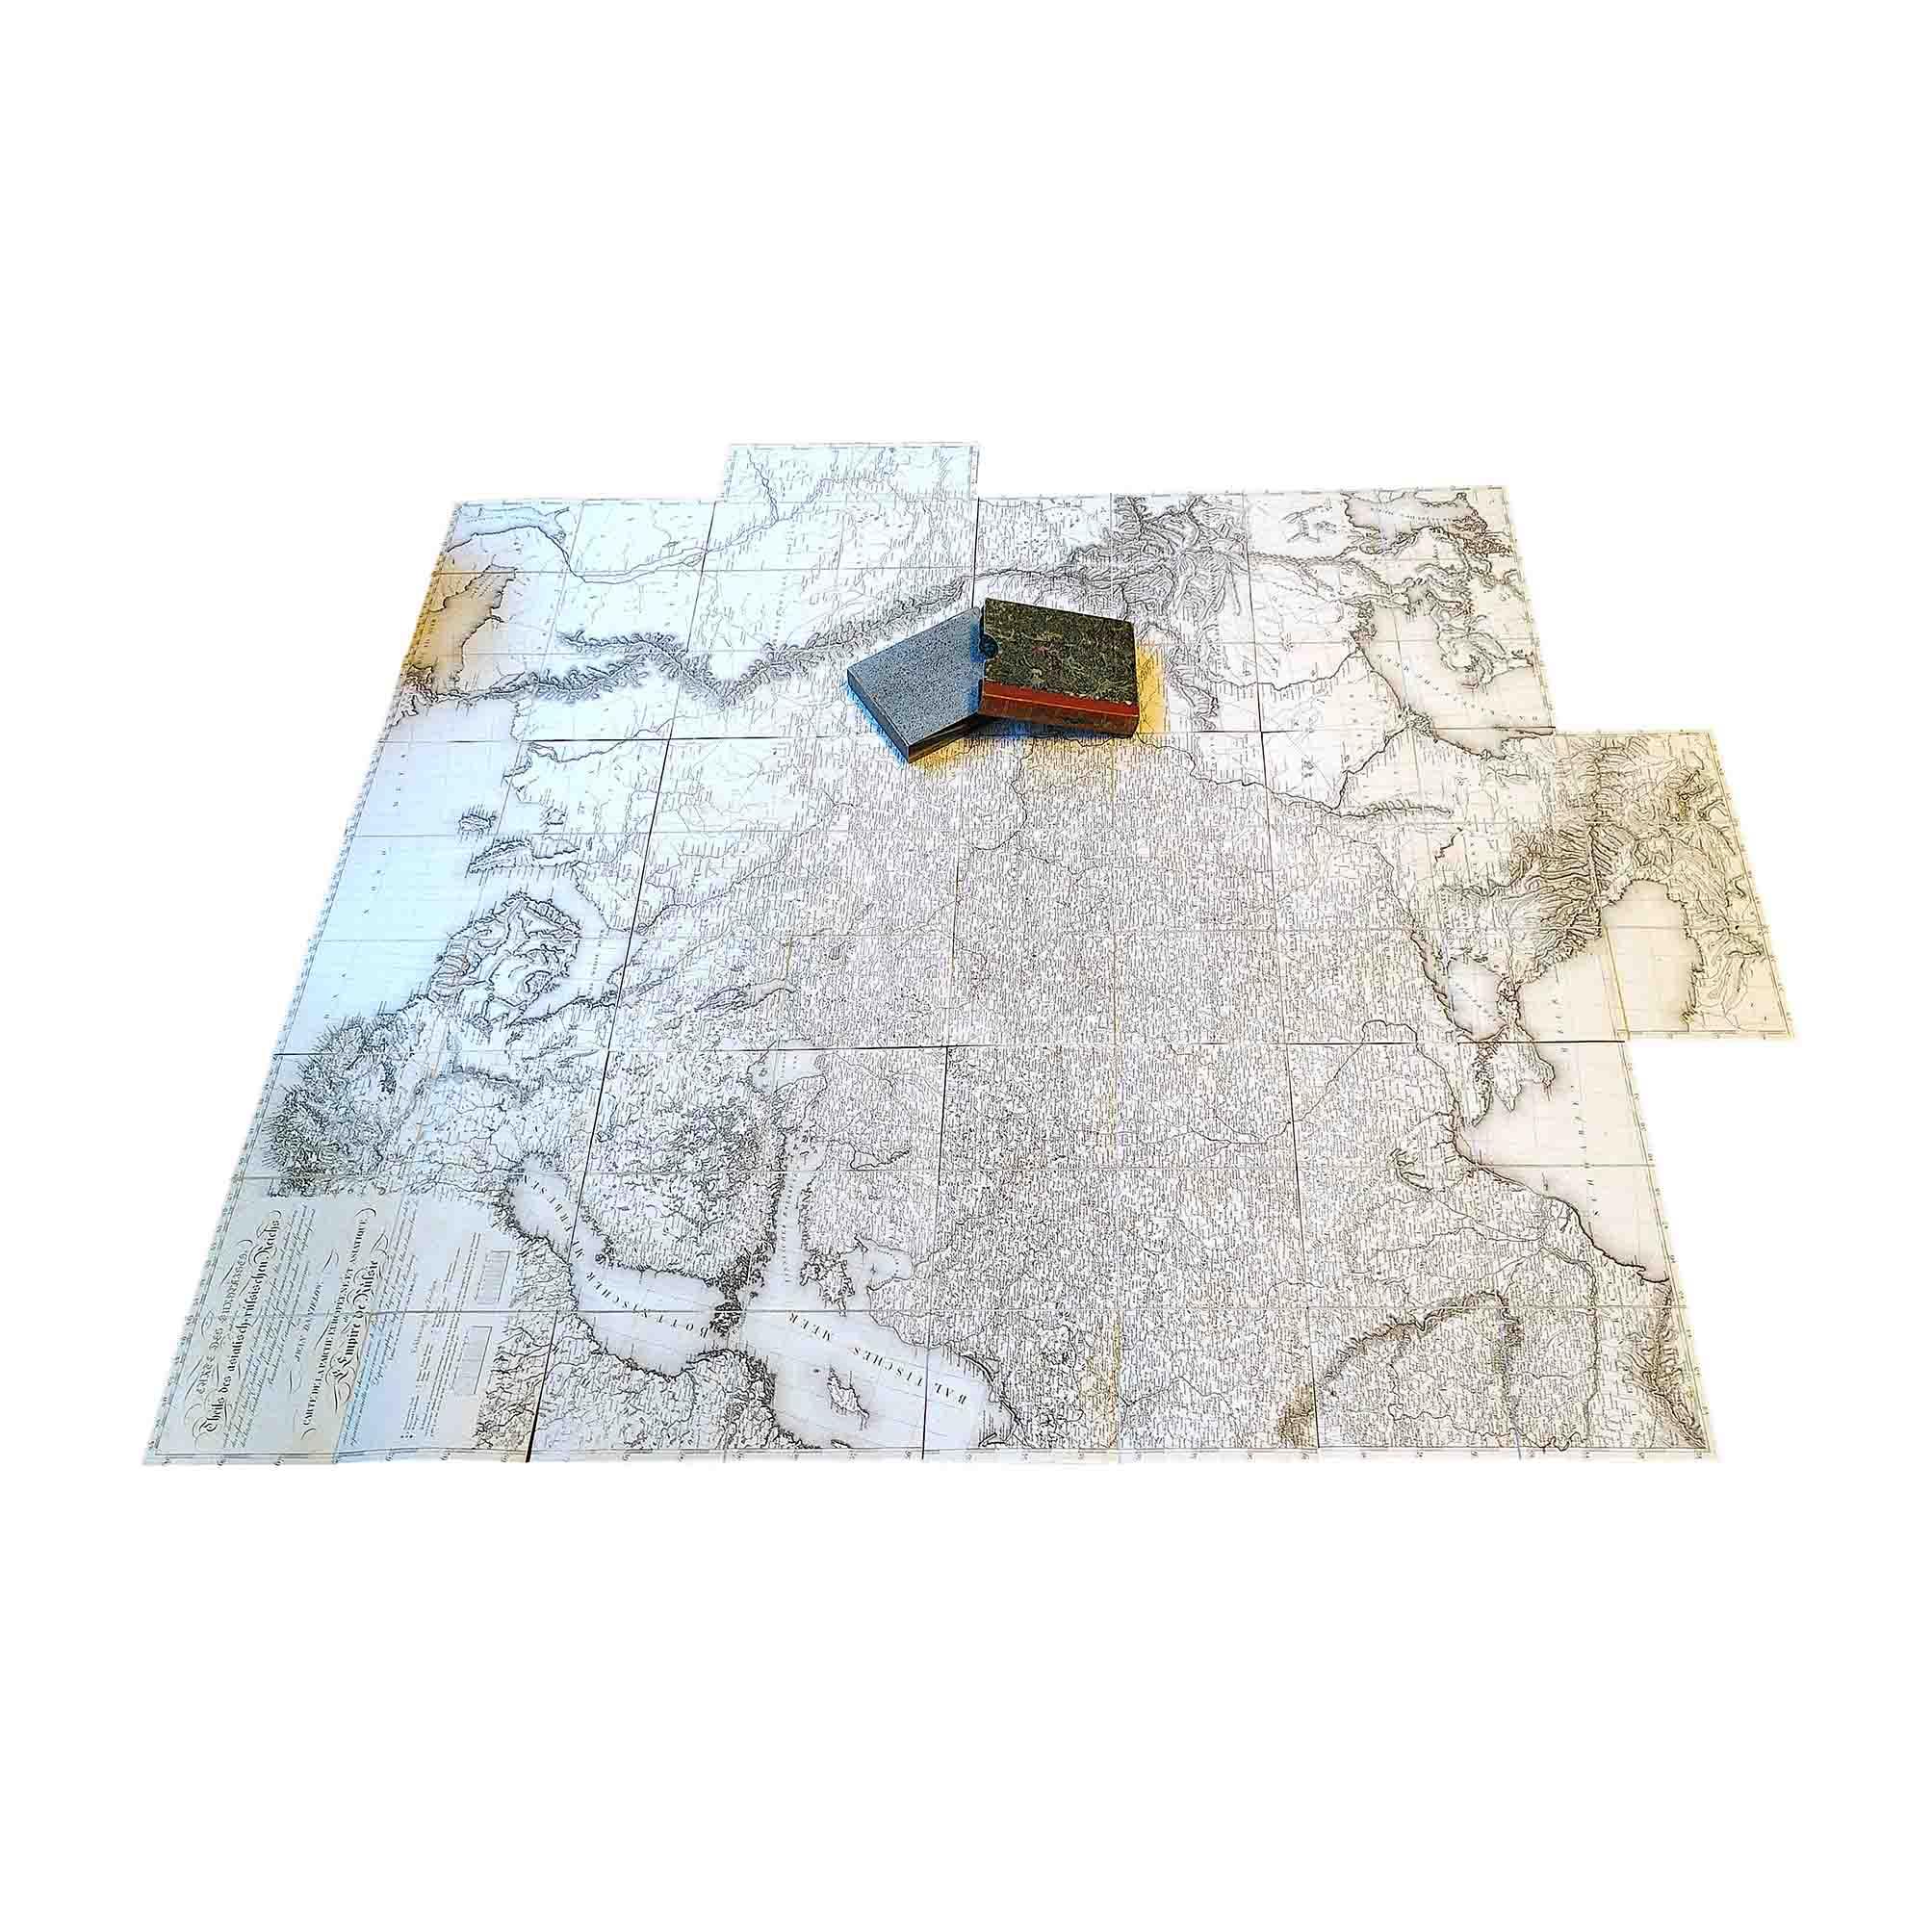 5989-Danielov-Russia-Map-1812-Open-Complete-free-N.jpg